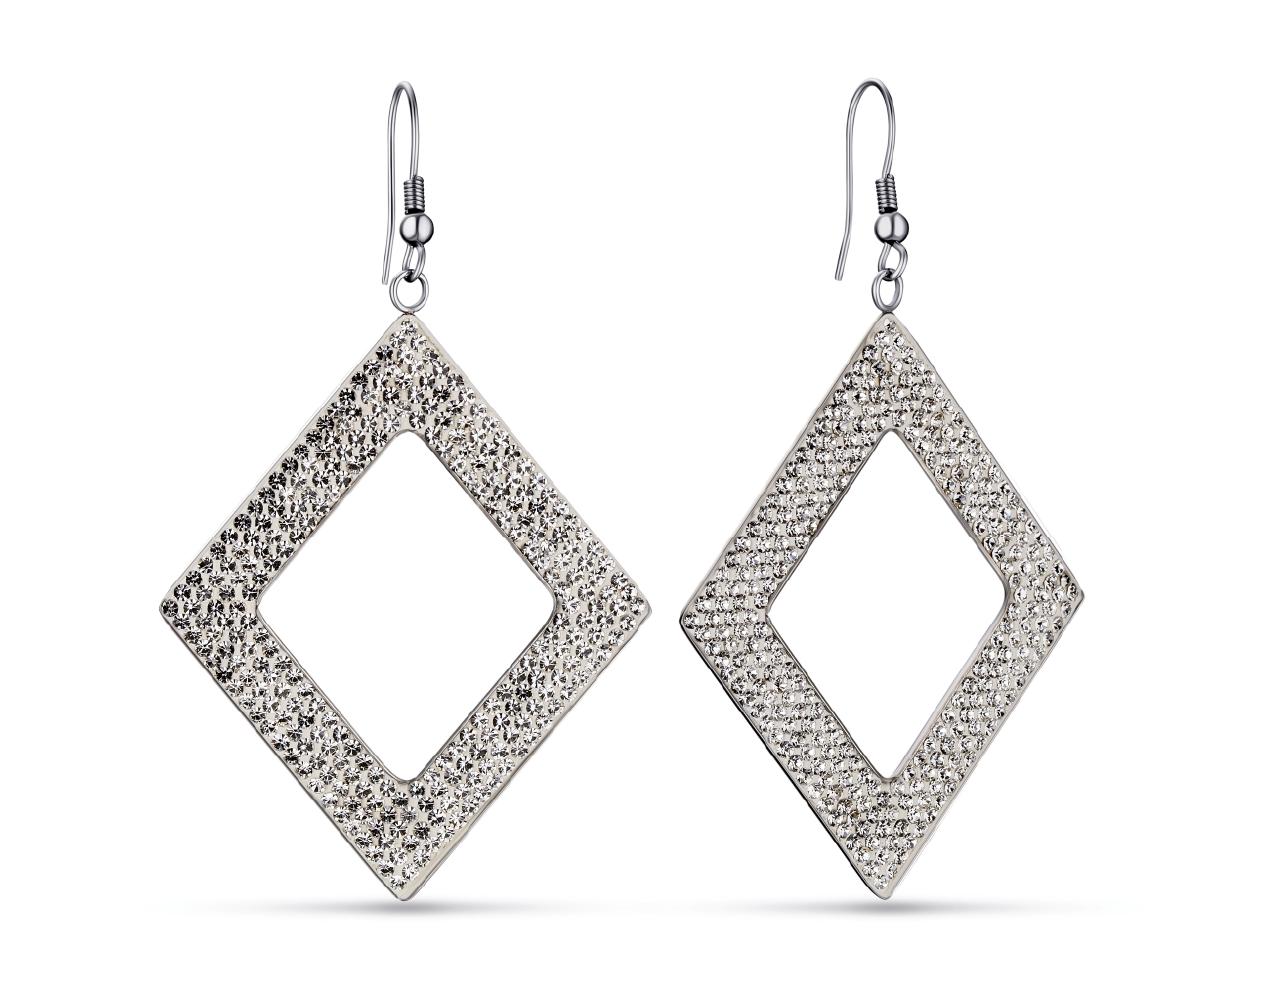 Rhombus-shaped jewelry is popular